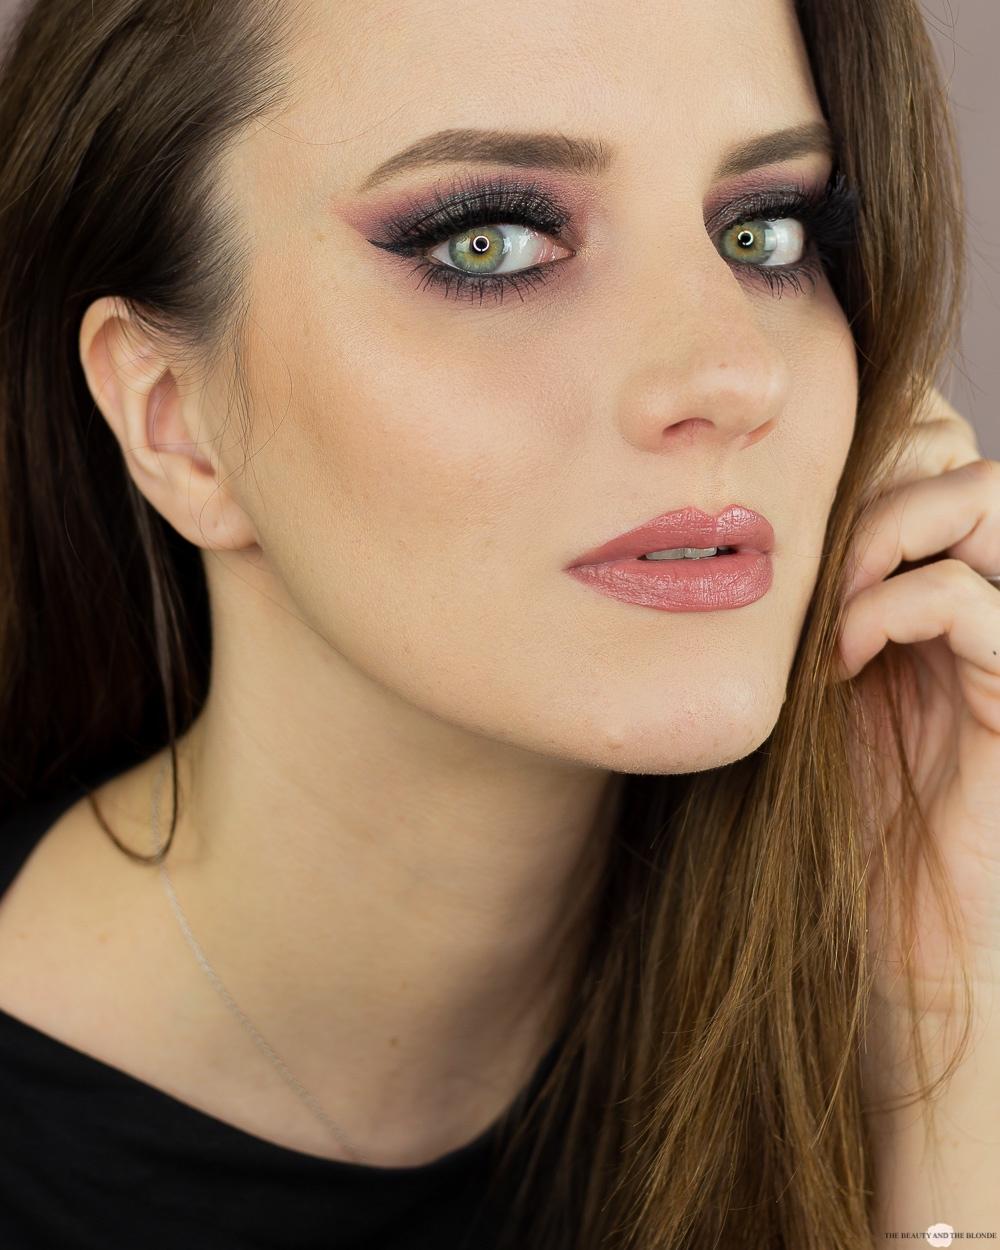 bh Cosmetics x Alycia Marie Palette Rituals Look